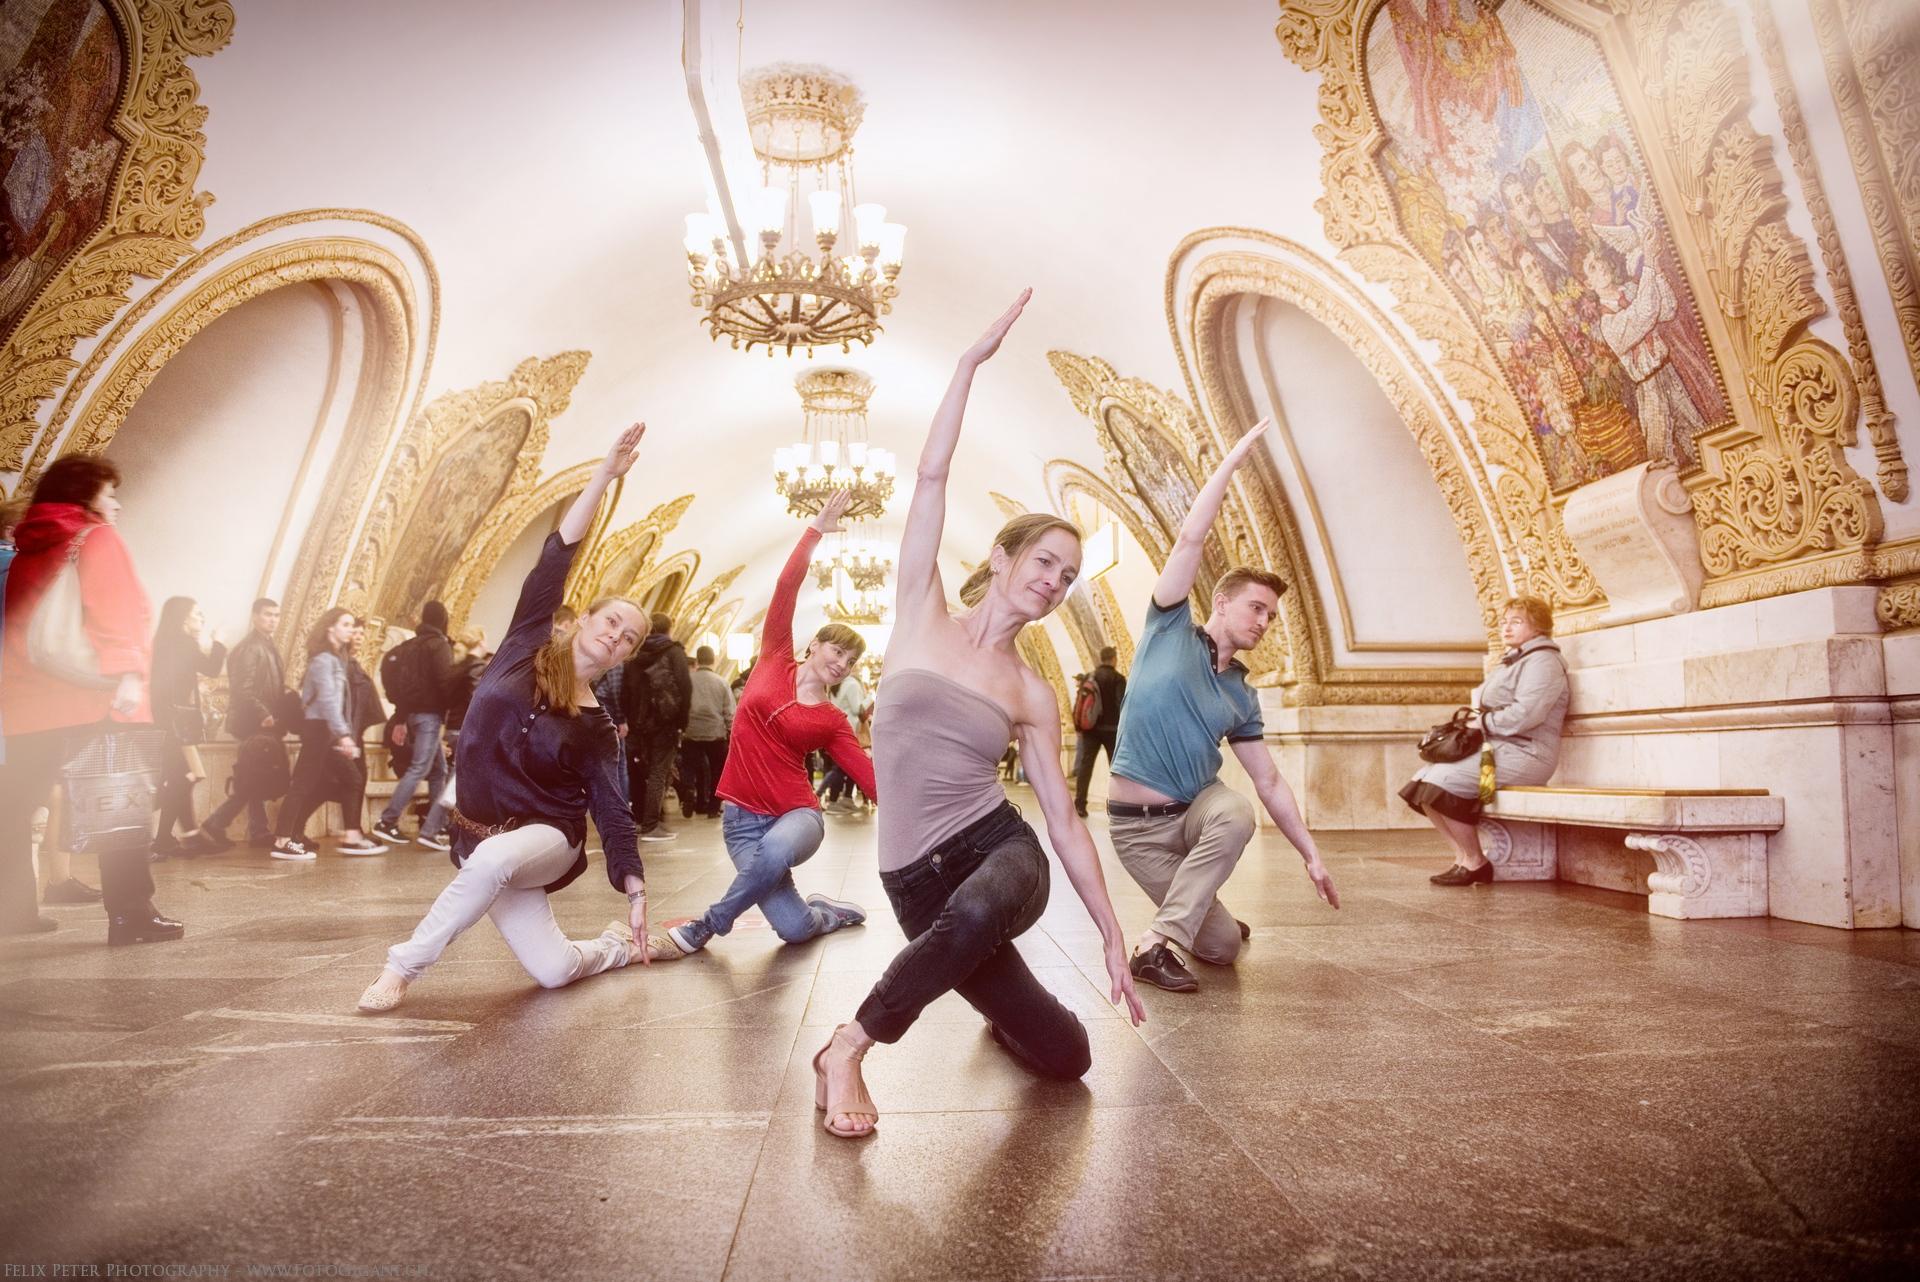 Felix-Peter-Yoga-Pilates-Dance-Fotografie_Bern_113.jpg